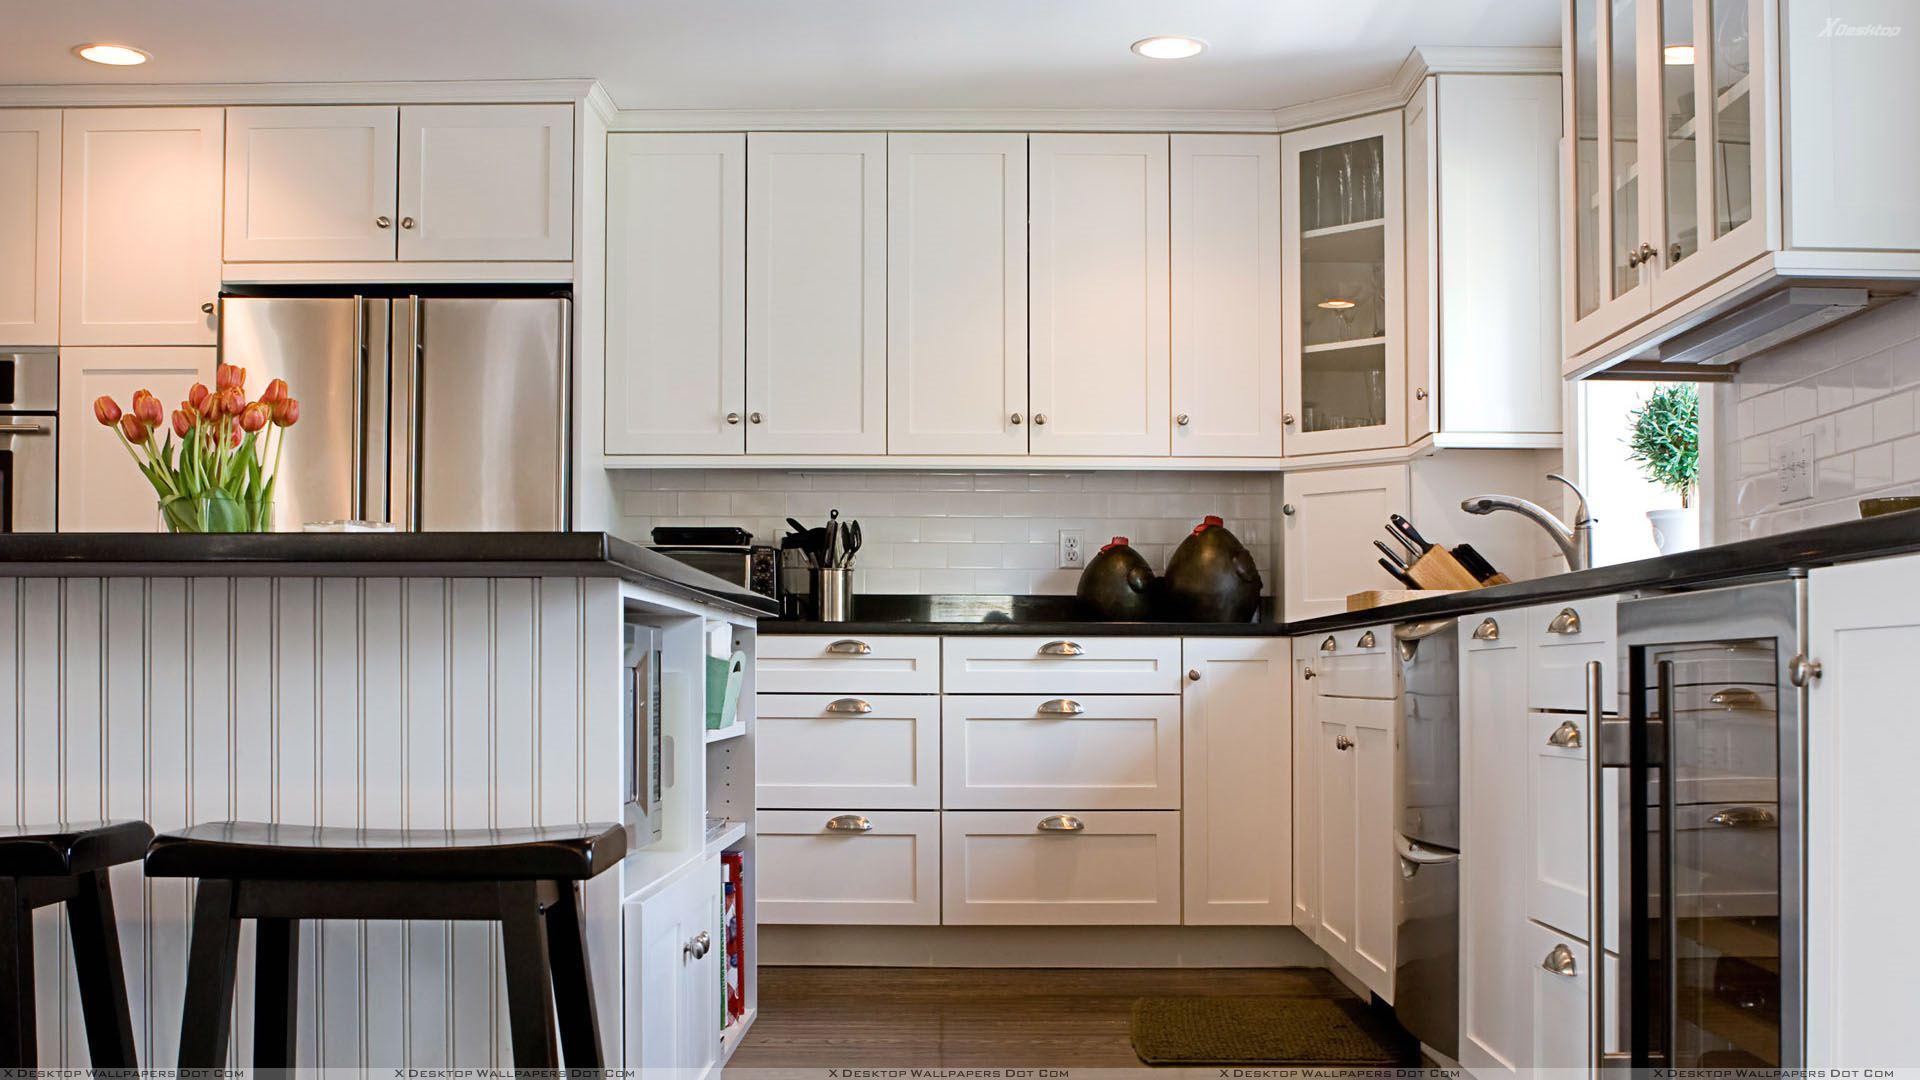 Kitchen Wallpaper with White Background - WallpaperSafari